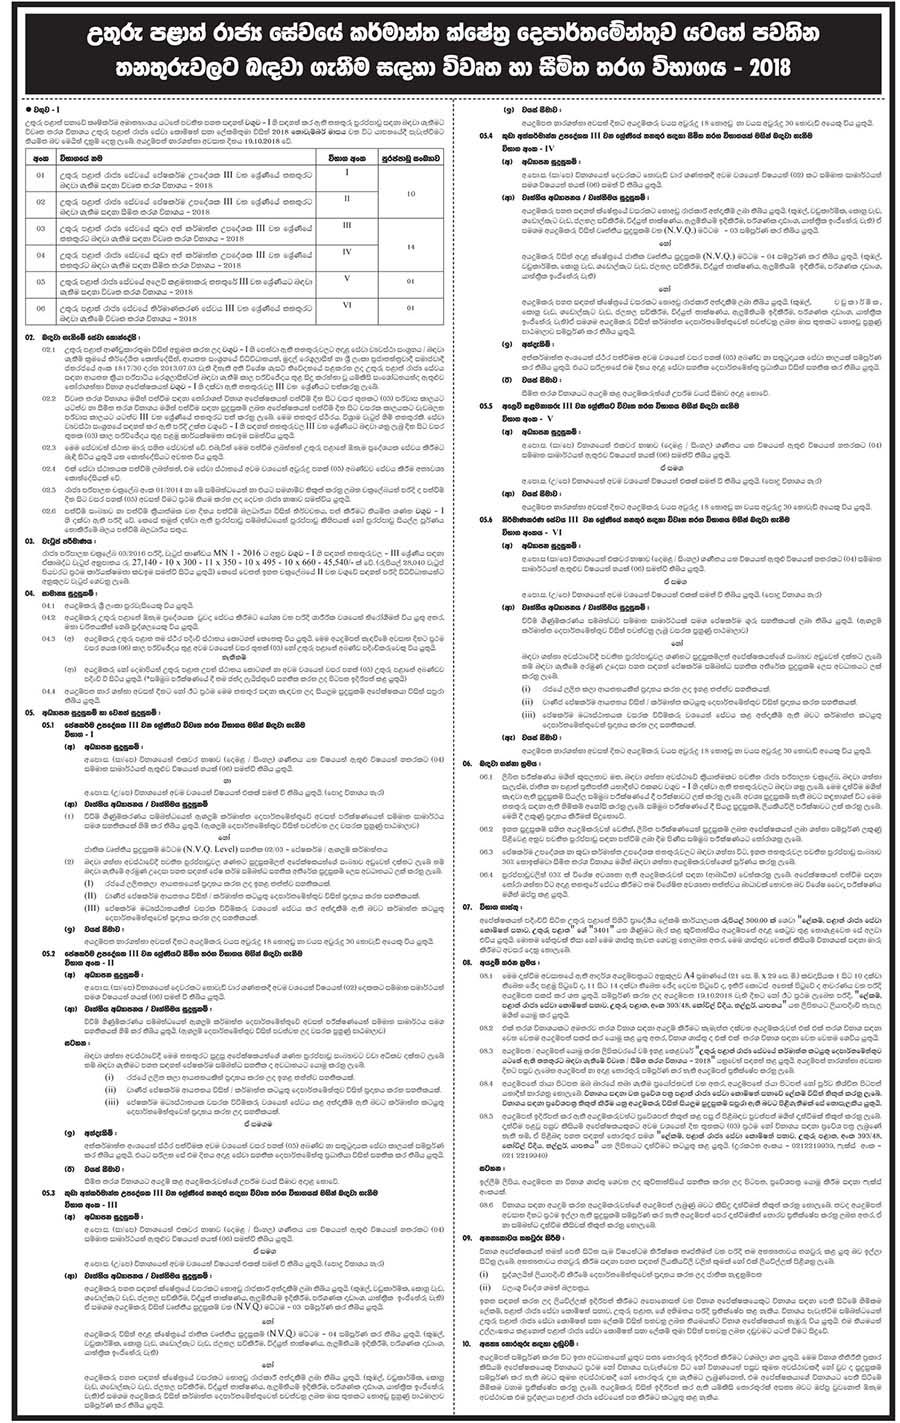 Vacancies at Provincial Public Service Commission - Northern Provincial Council